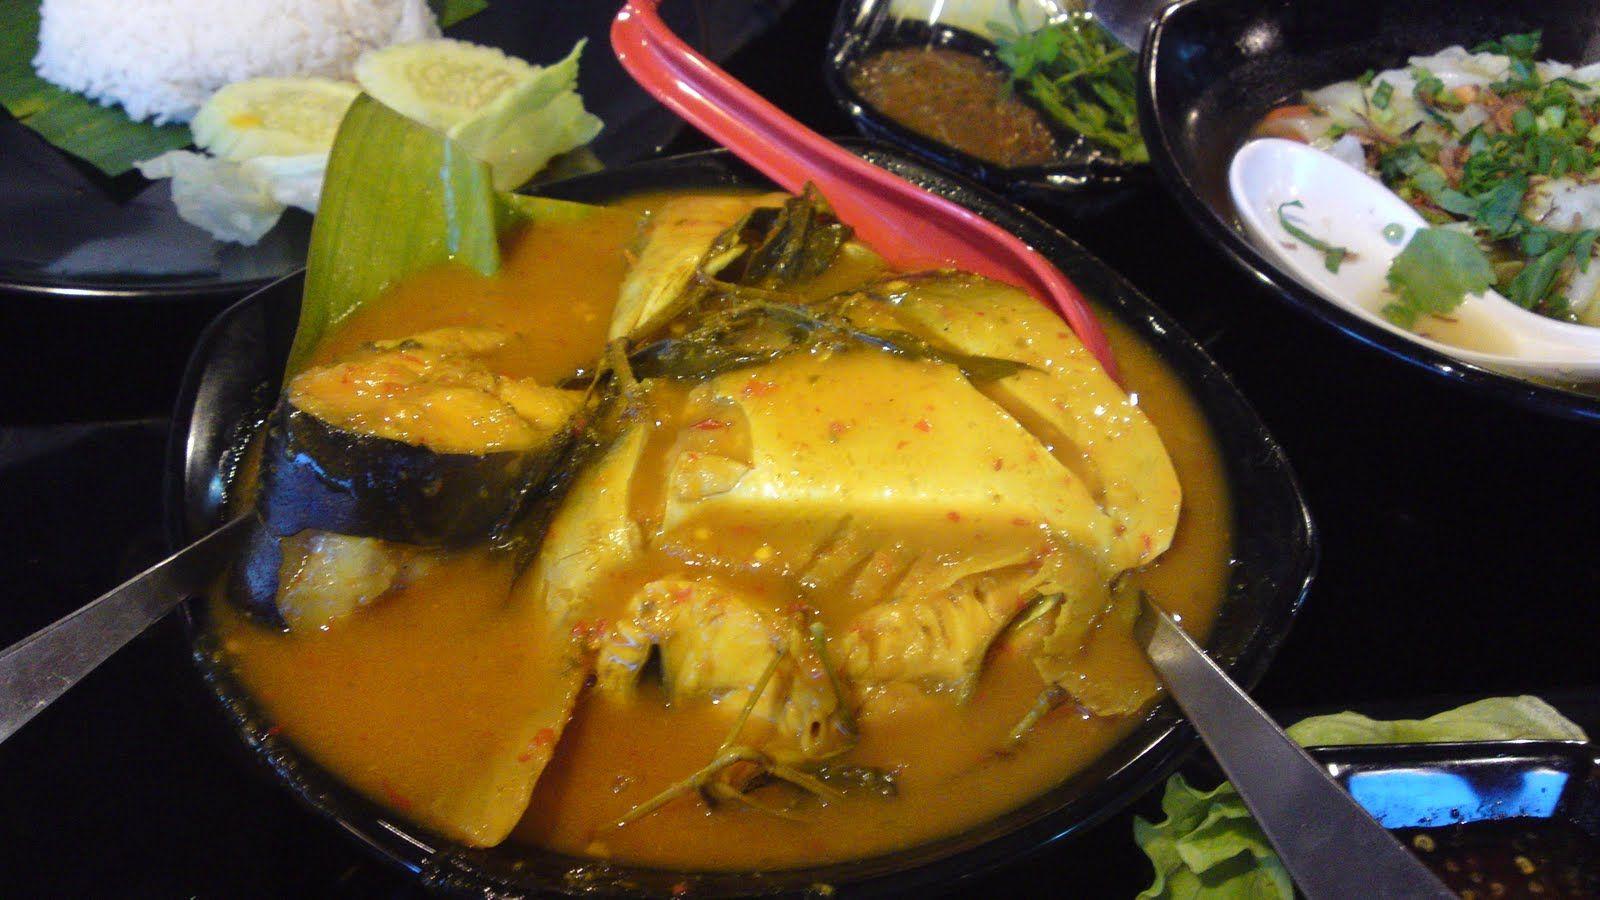 ikan patin masak tempoyak resep resep ikan kunyit Resepi Ikan Rohu Masak Tempoyak Enak dan Mudah